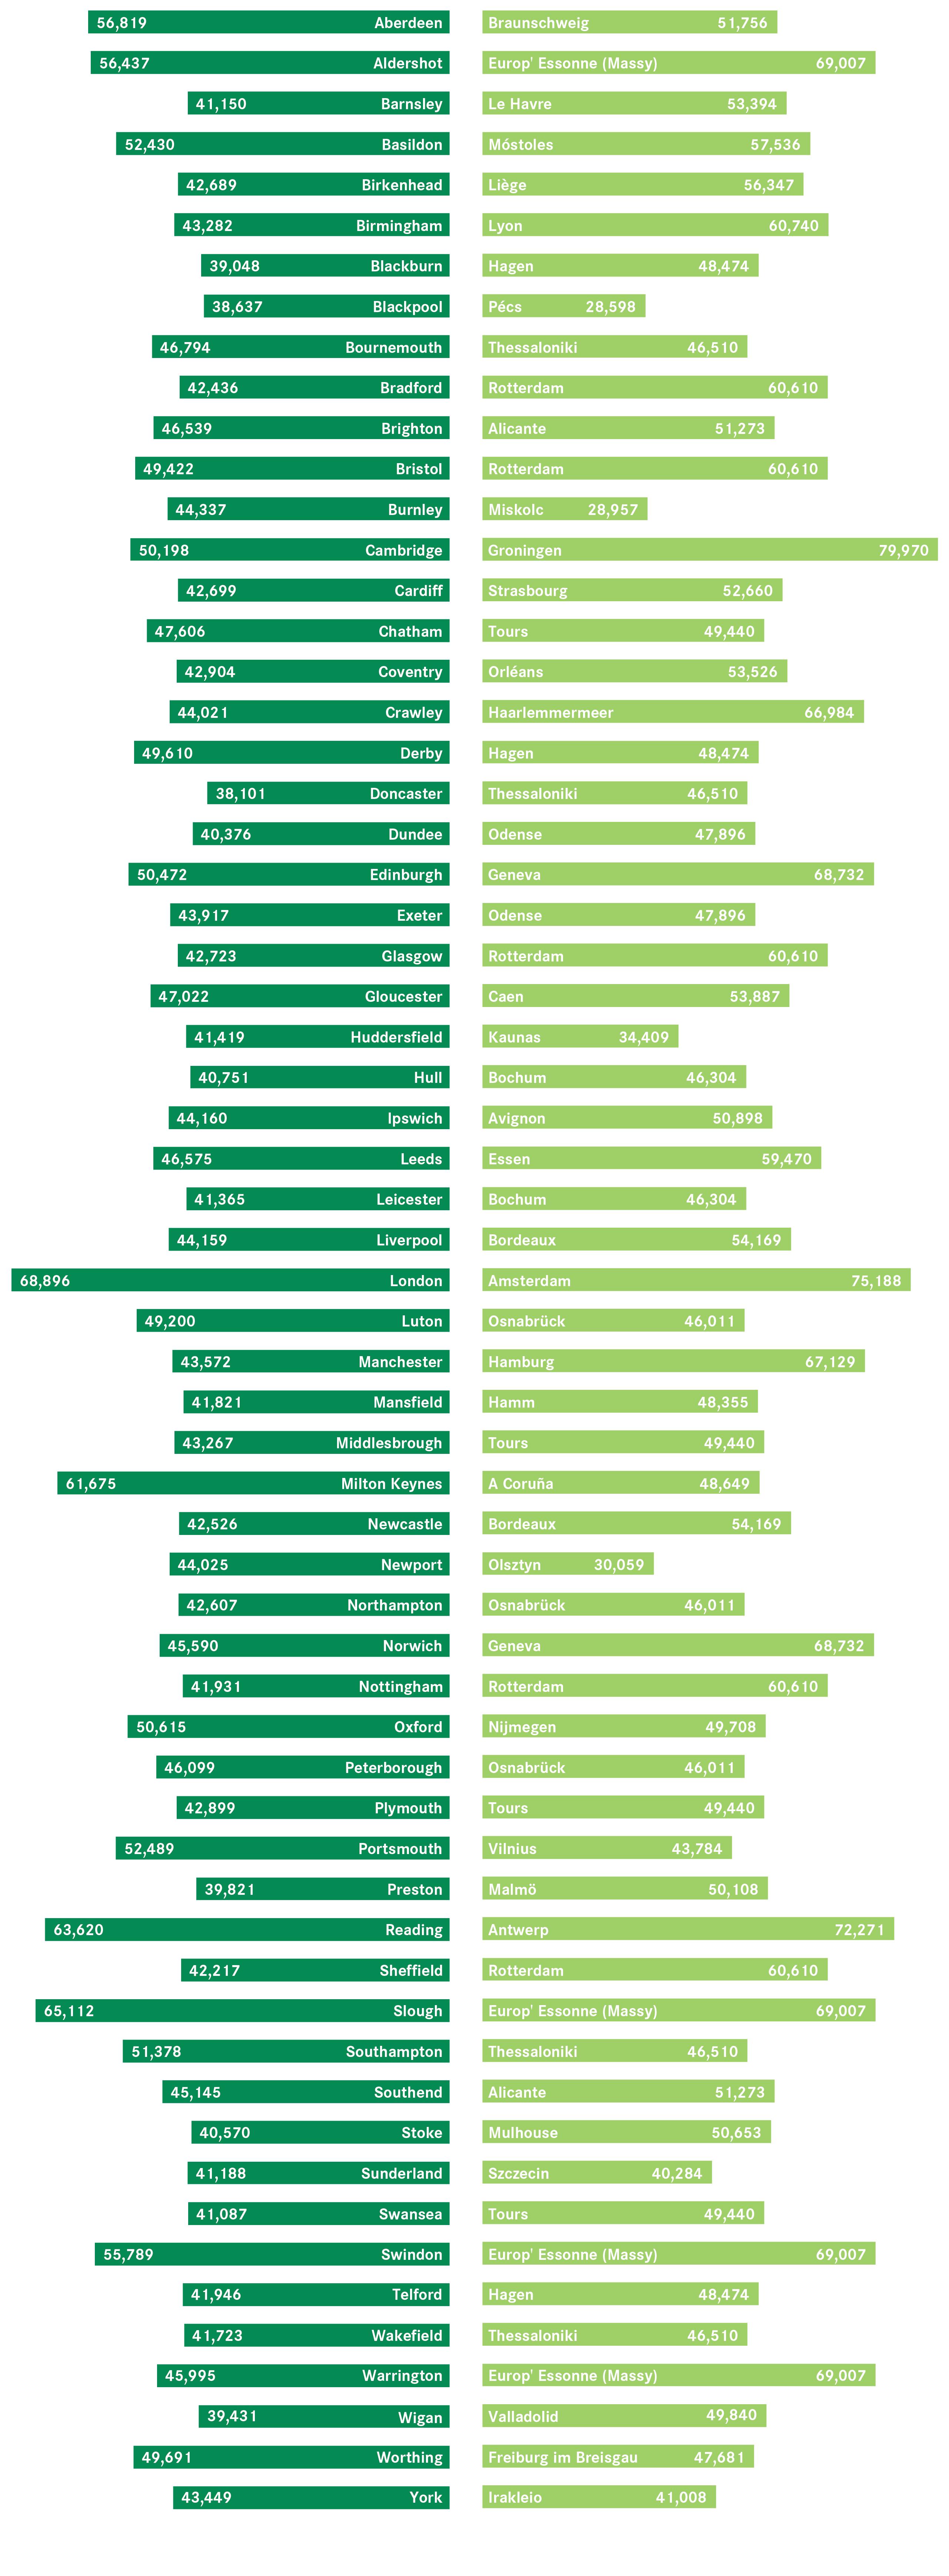 city-comparisons-bar-chart-01